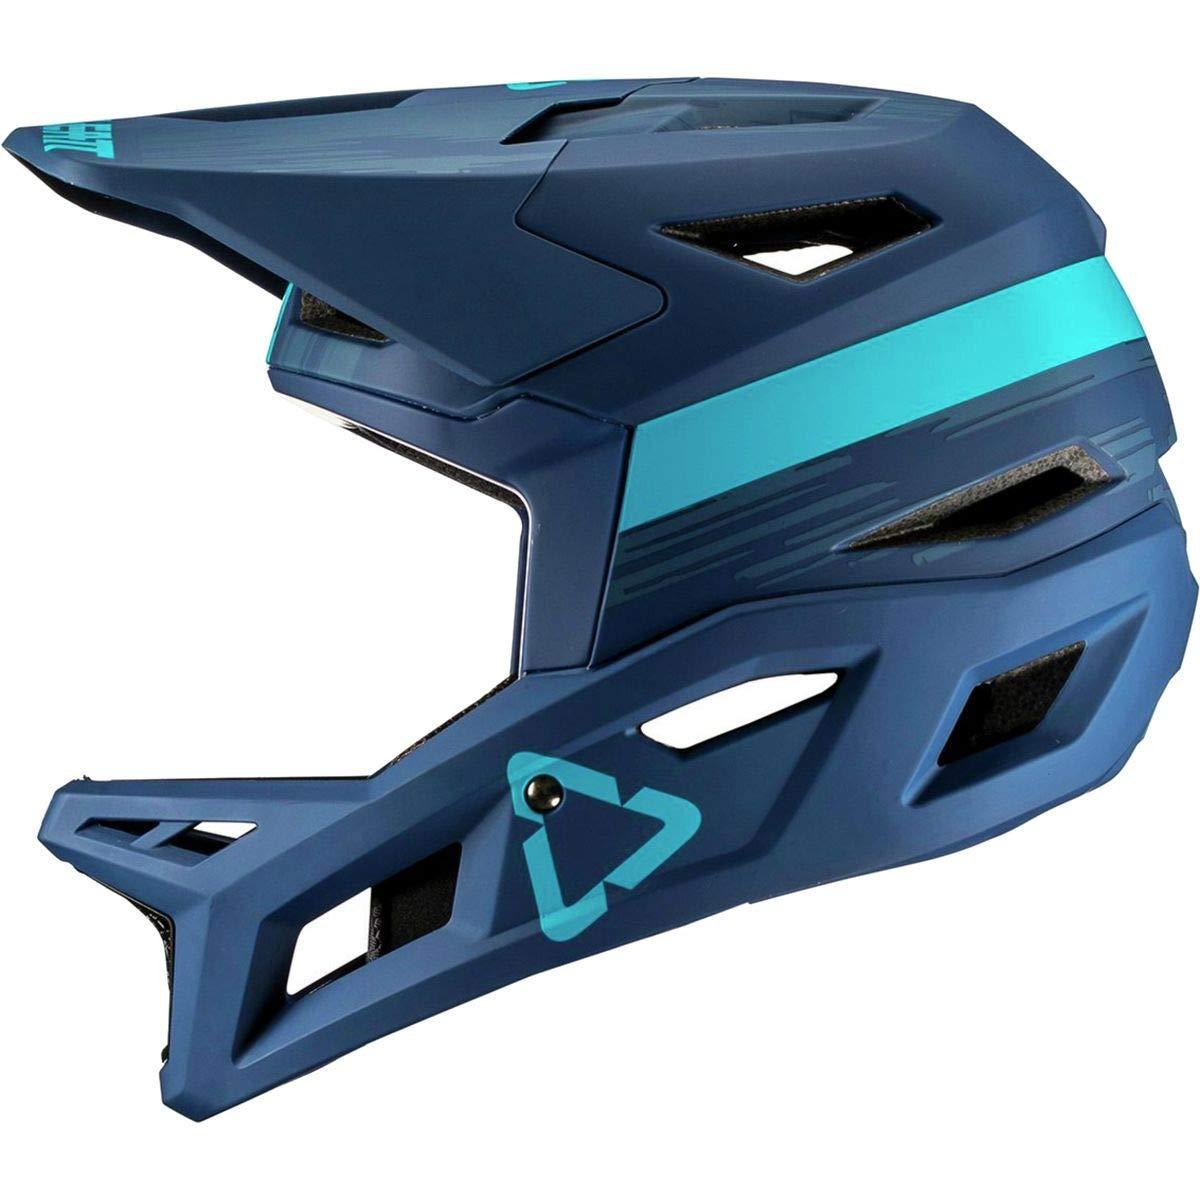 Leatt DBX 4.0 V19.1 Adult Off-Road BMX Cycling Helmet